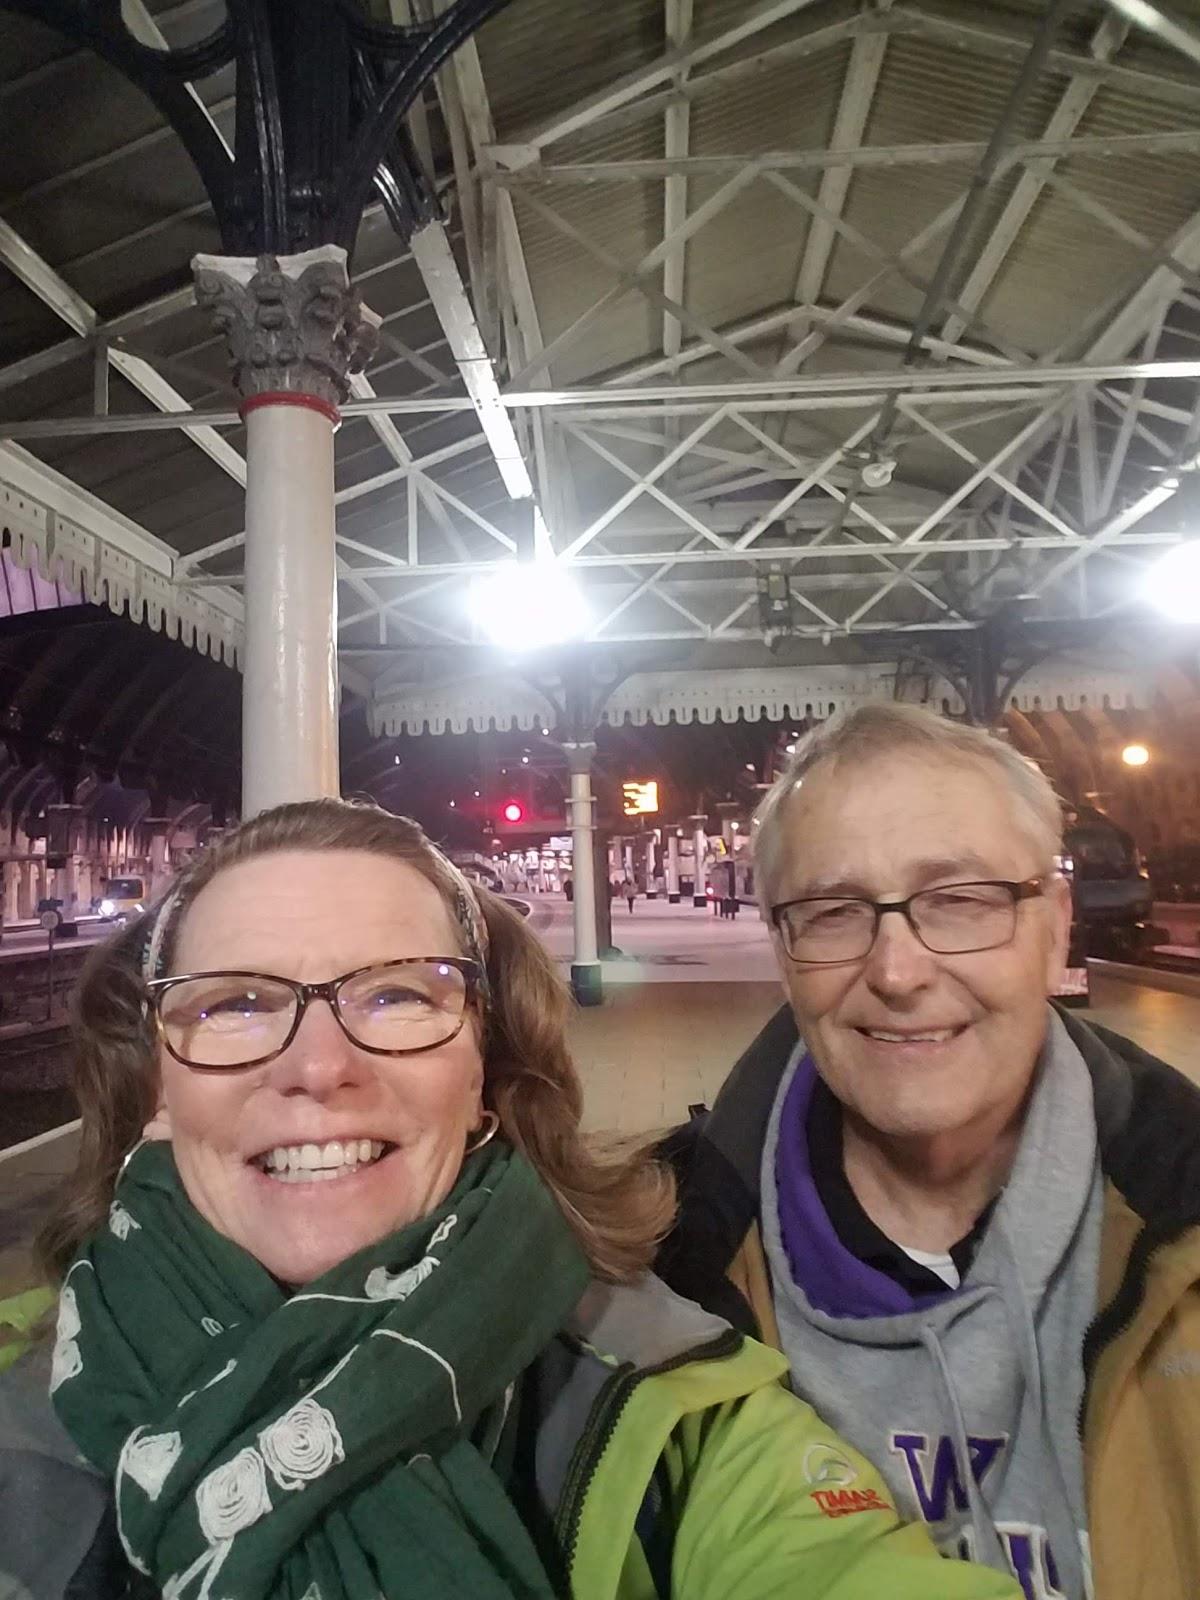 Darryl and Cindy Cunningham: My Irish Eyes Are Smilin' - Ireland Day - 1